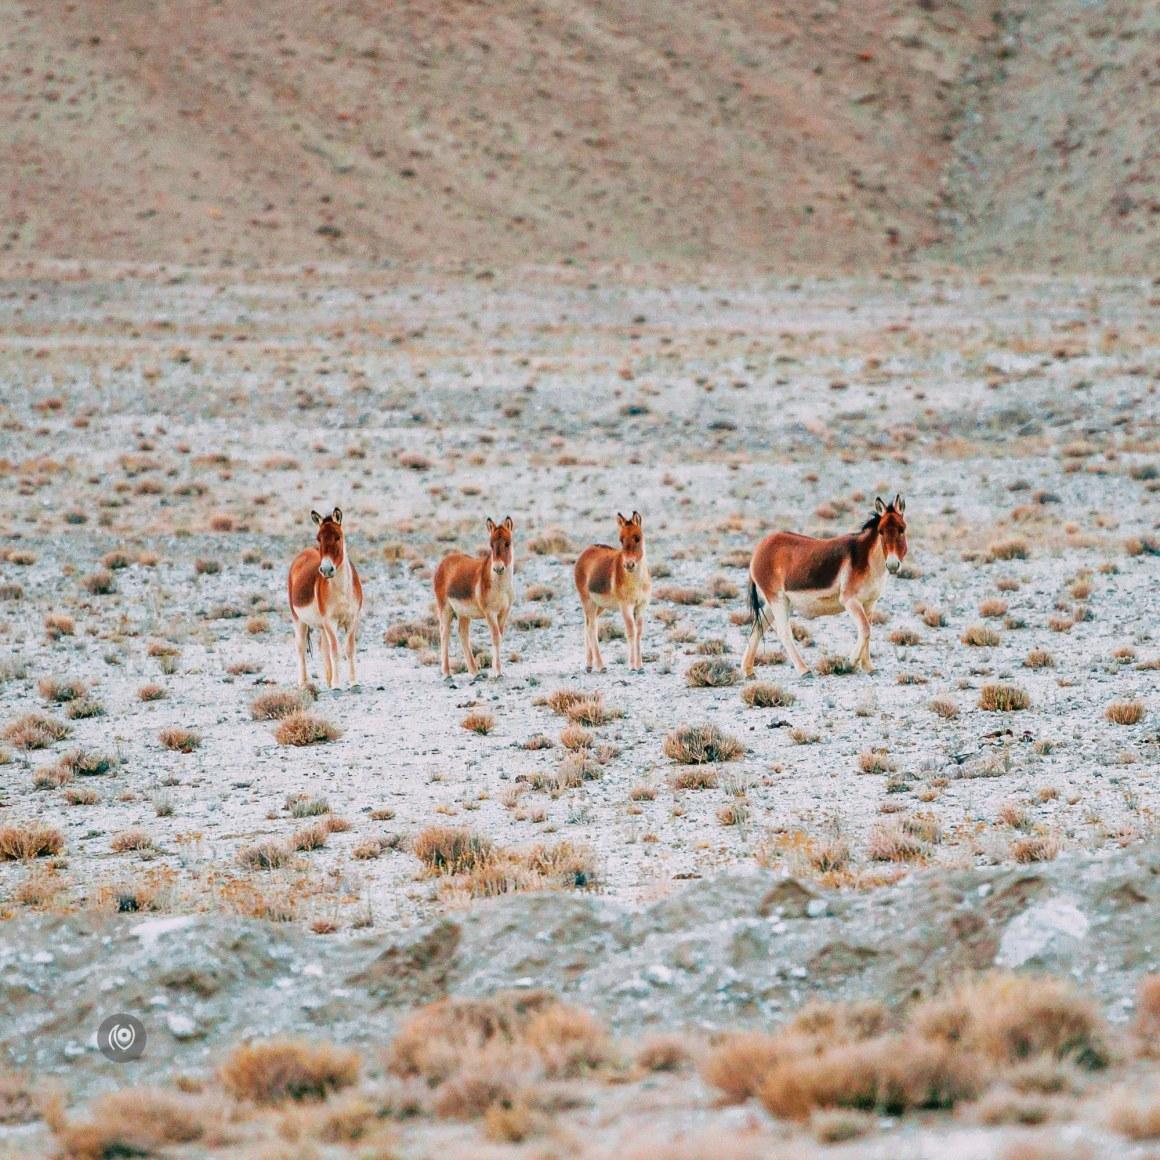 Naina.co, #Landscape, #EyesForDestinations, Ladakh, Leh, India, Travel, Professional Photographer, Photo Prints, #EyesforIndia, Wild Animals, Wild Ass, Fox, Asses, Mountains, Mountain Ranges, Travel Photographer, Lifestyle Photographer, Luxury Photographer, Travel Blogger, Lifestyle Blogger, Luxury Blogger, Blogger